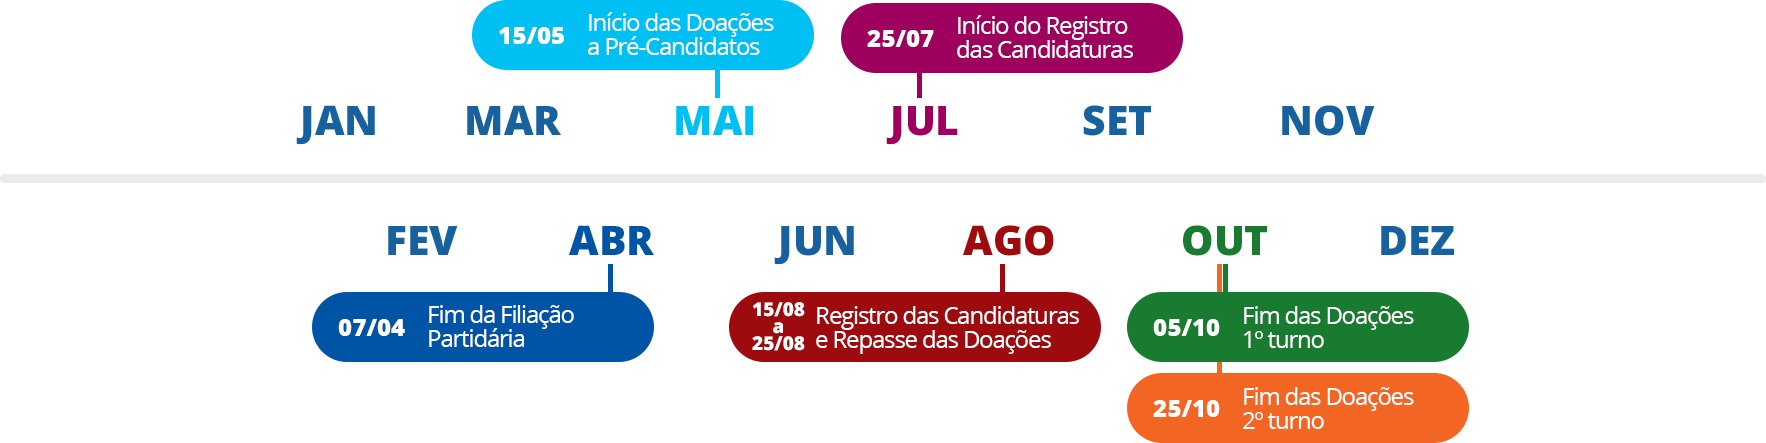 Agenda Eleitoral